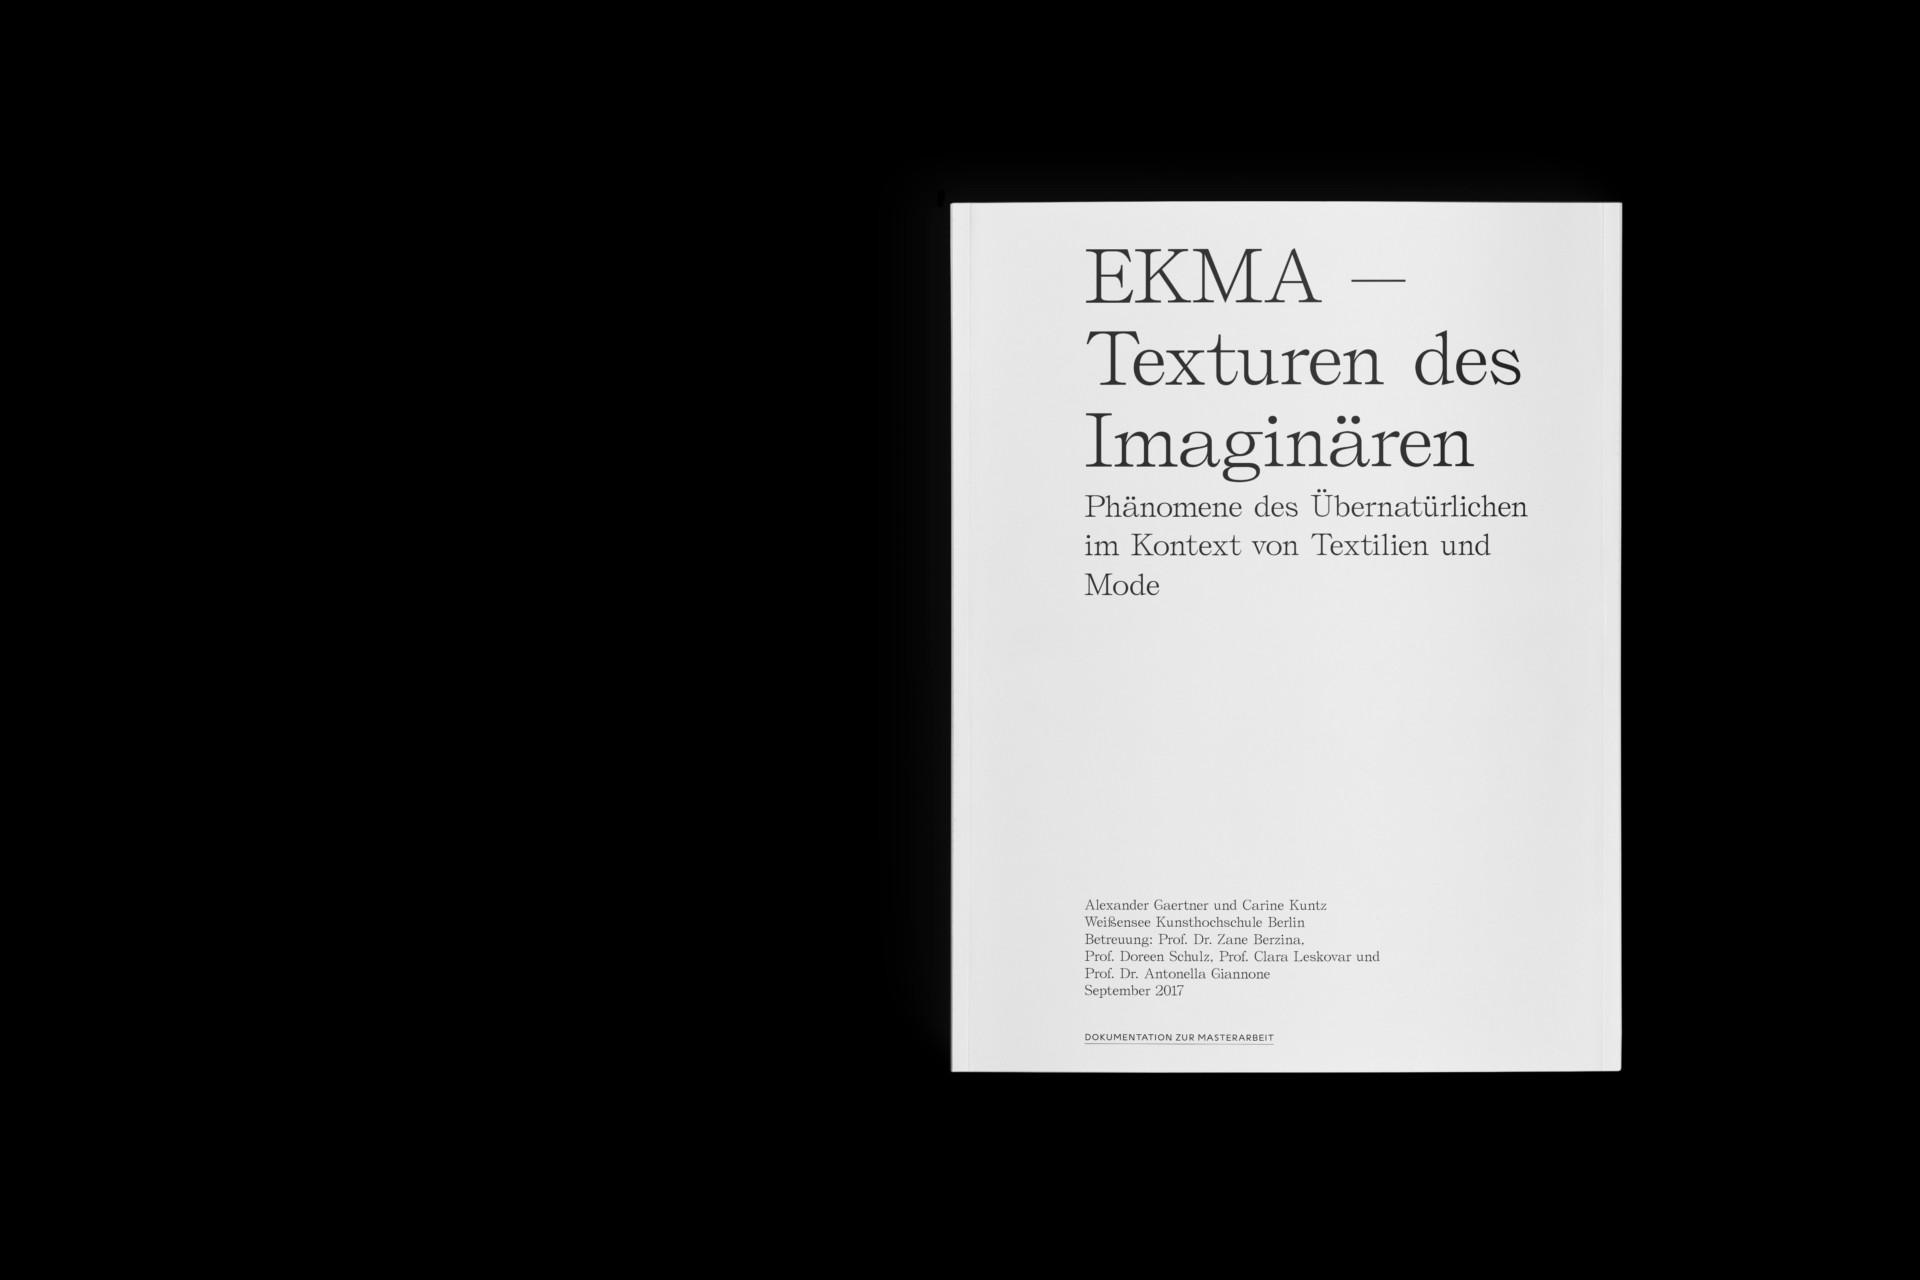 Design & Creative direction Ekma